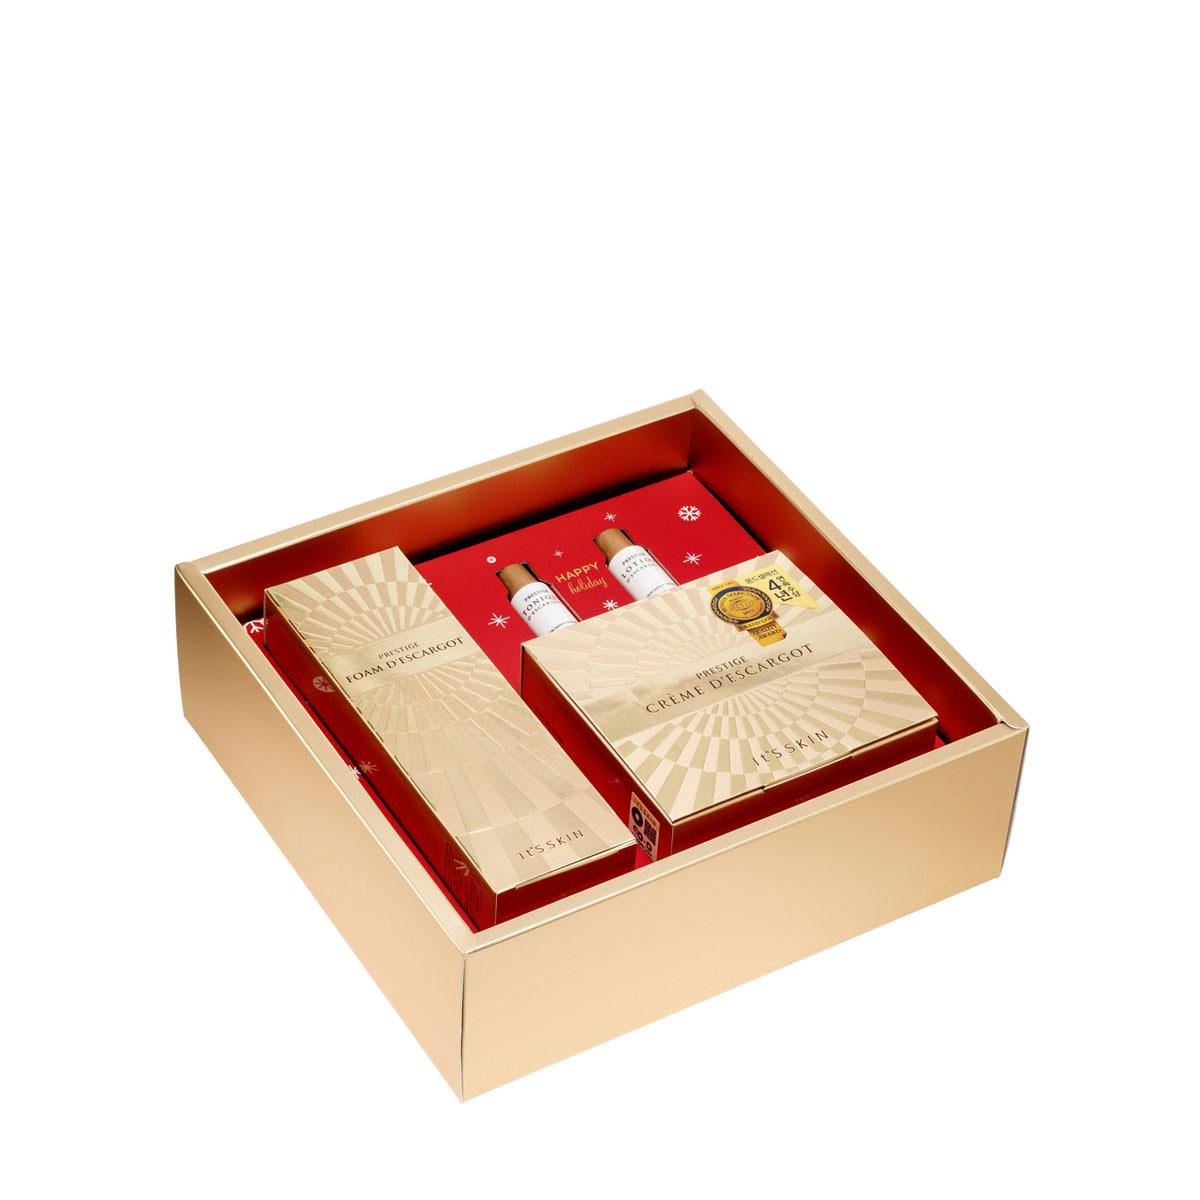 It'S SKIN Prestige D'escagot Limited Set Skincare Set (4piece)